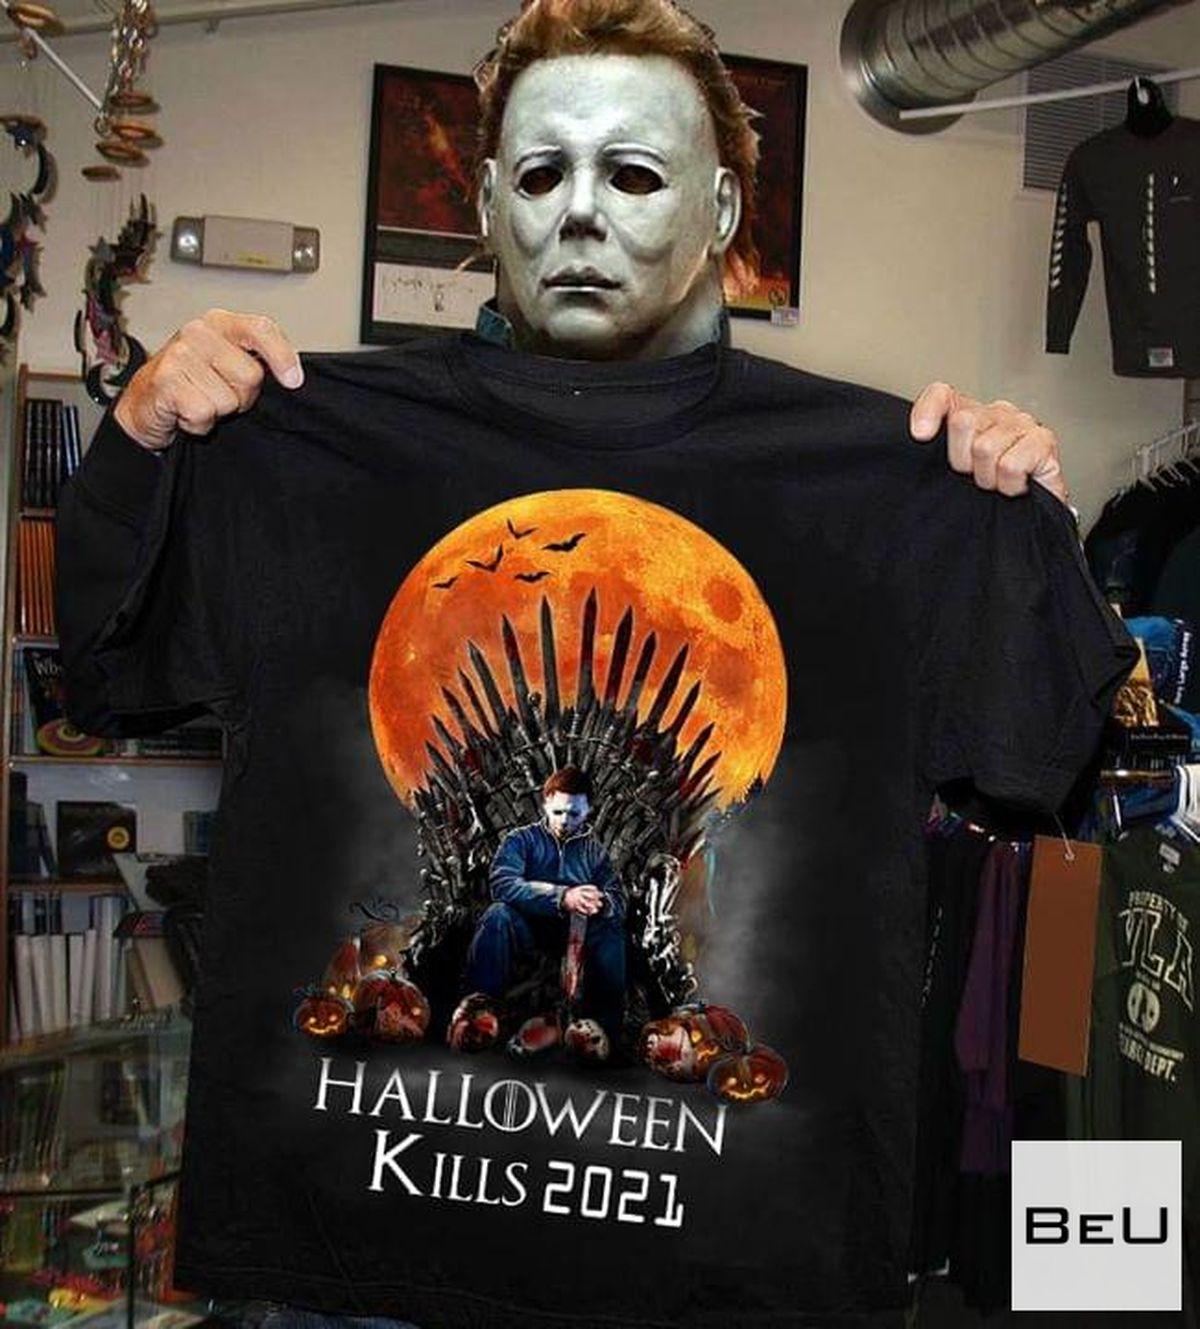 Halloween Kills 2021 Michael Myers Shirt